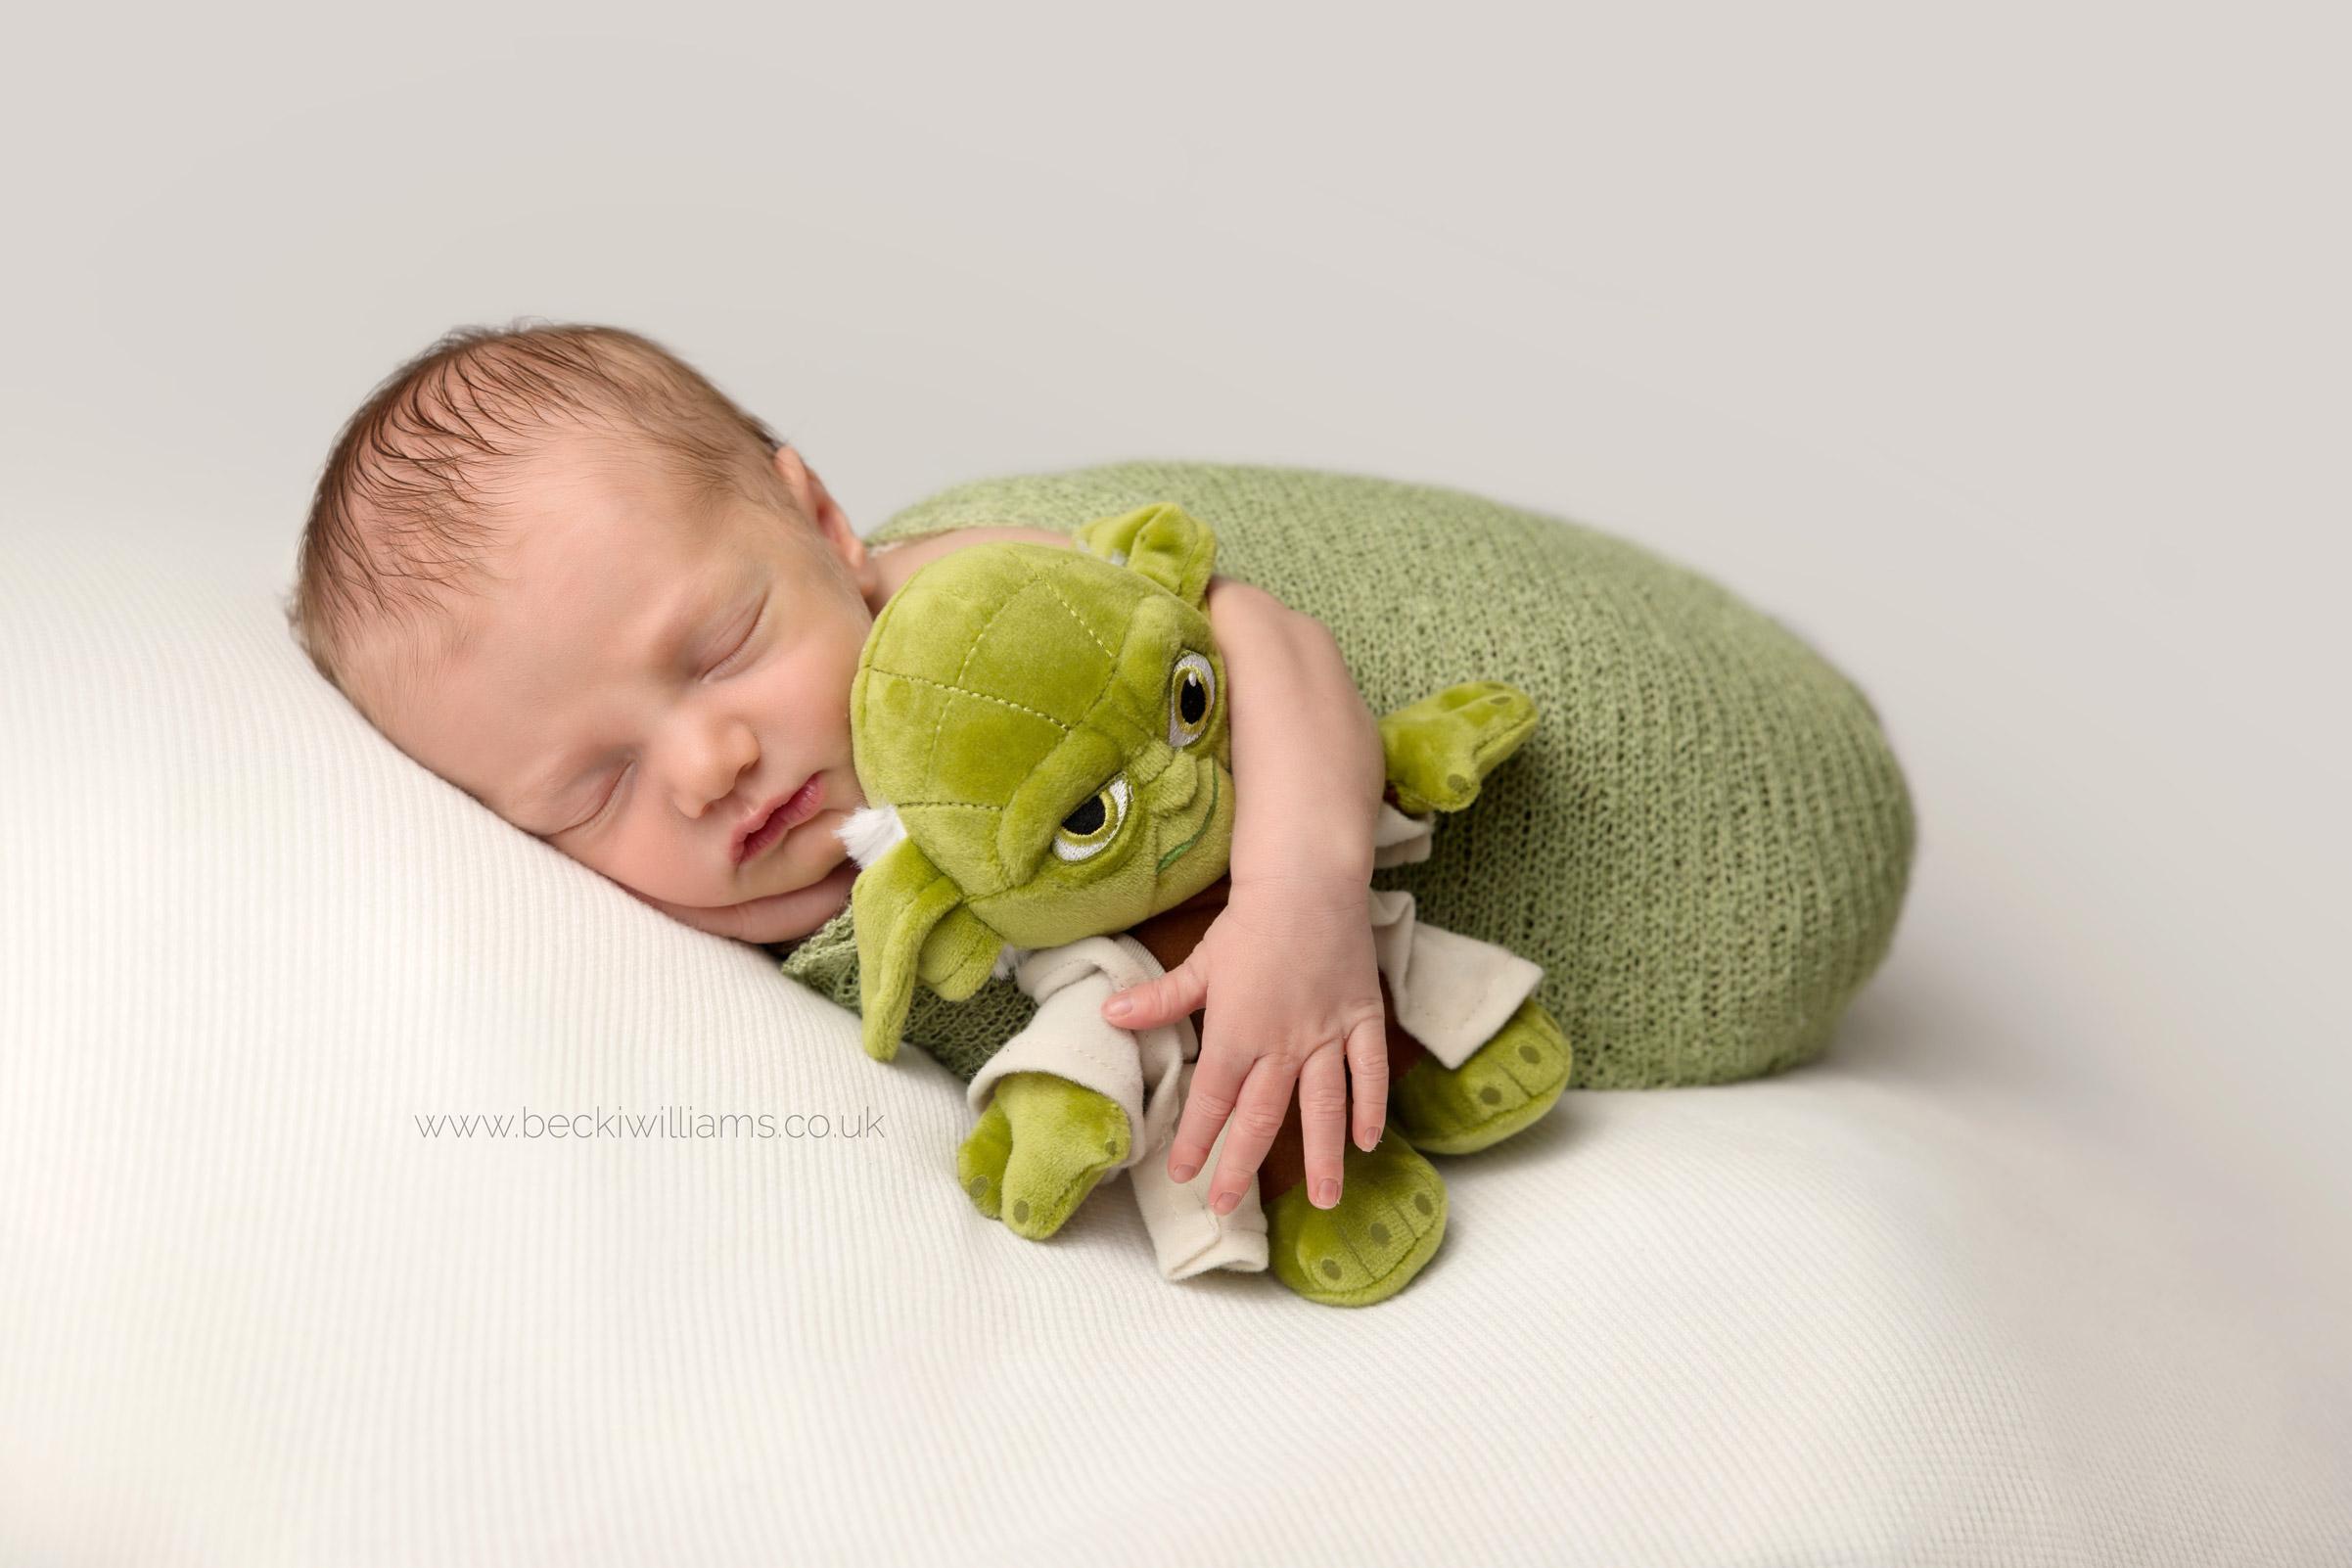 newborn baby boy wrapped in green holding a toy yoda at his newborn baby photo shoot in hemel hempstead